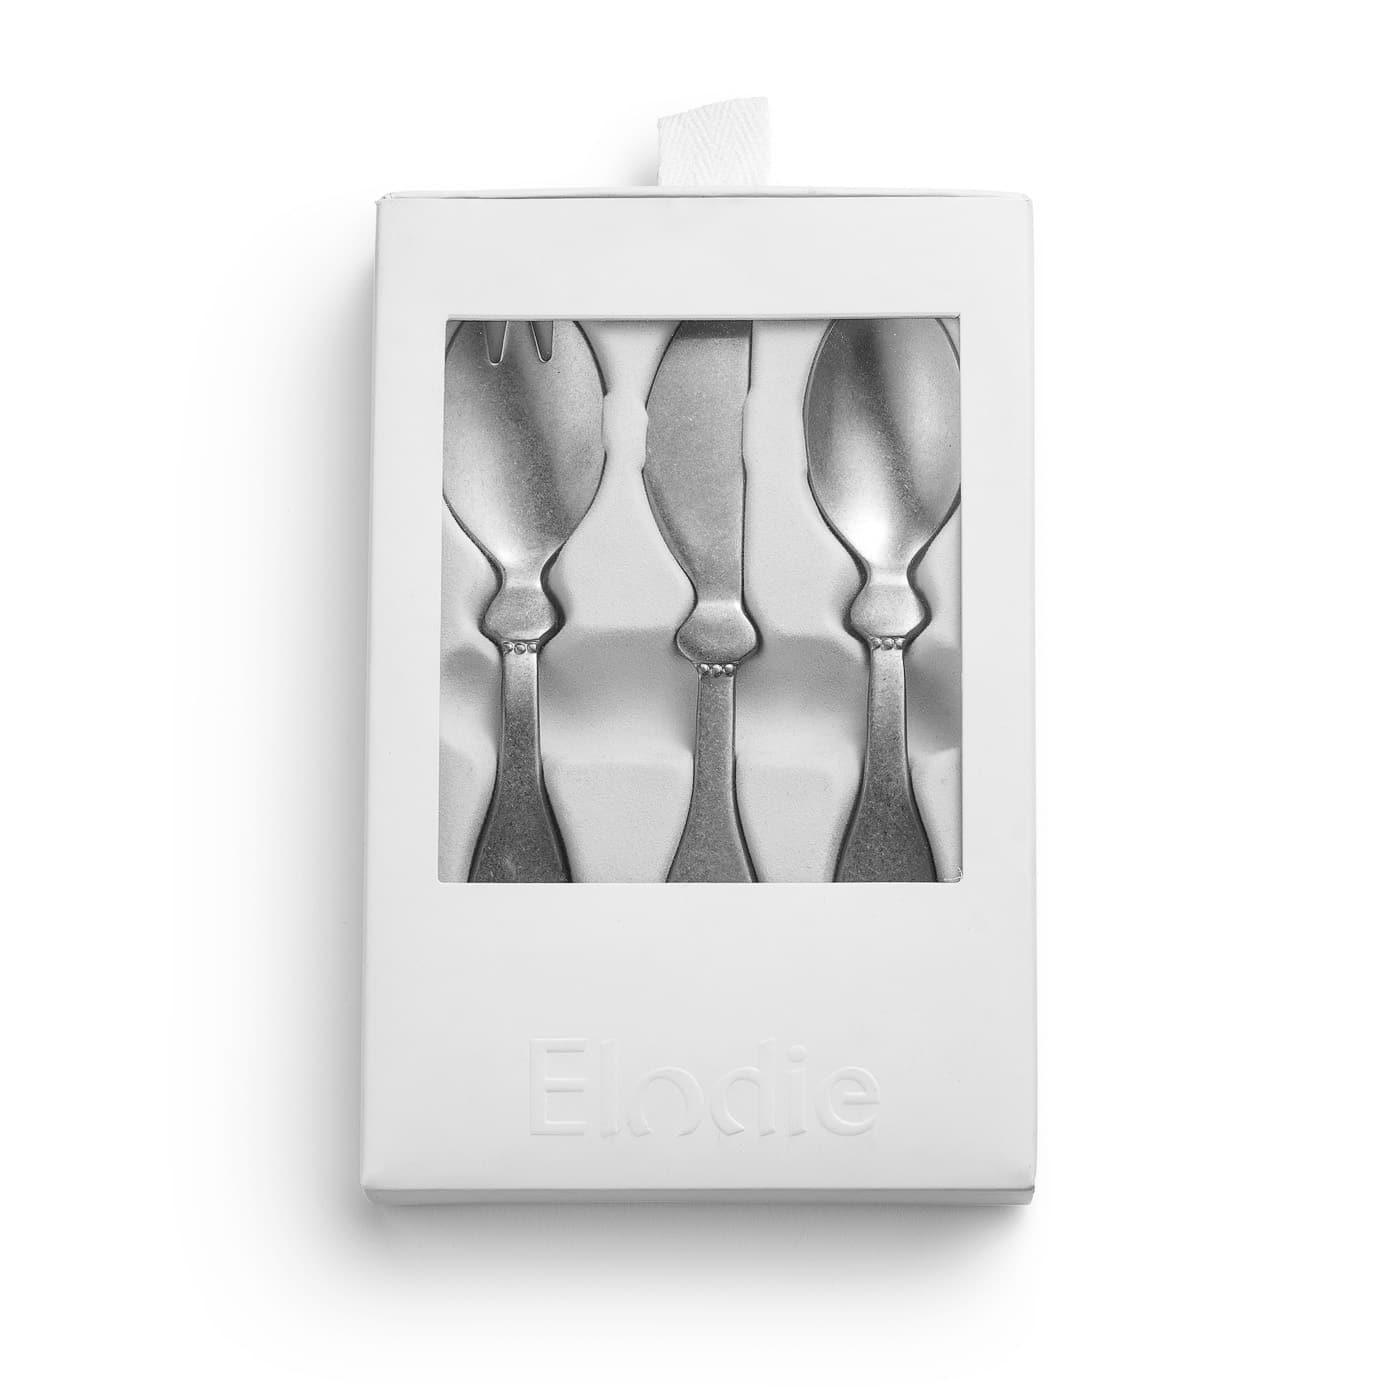 Childrens Cutlary Set Antique Silver 60265103350NA Frp 1400px